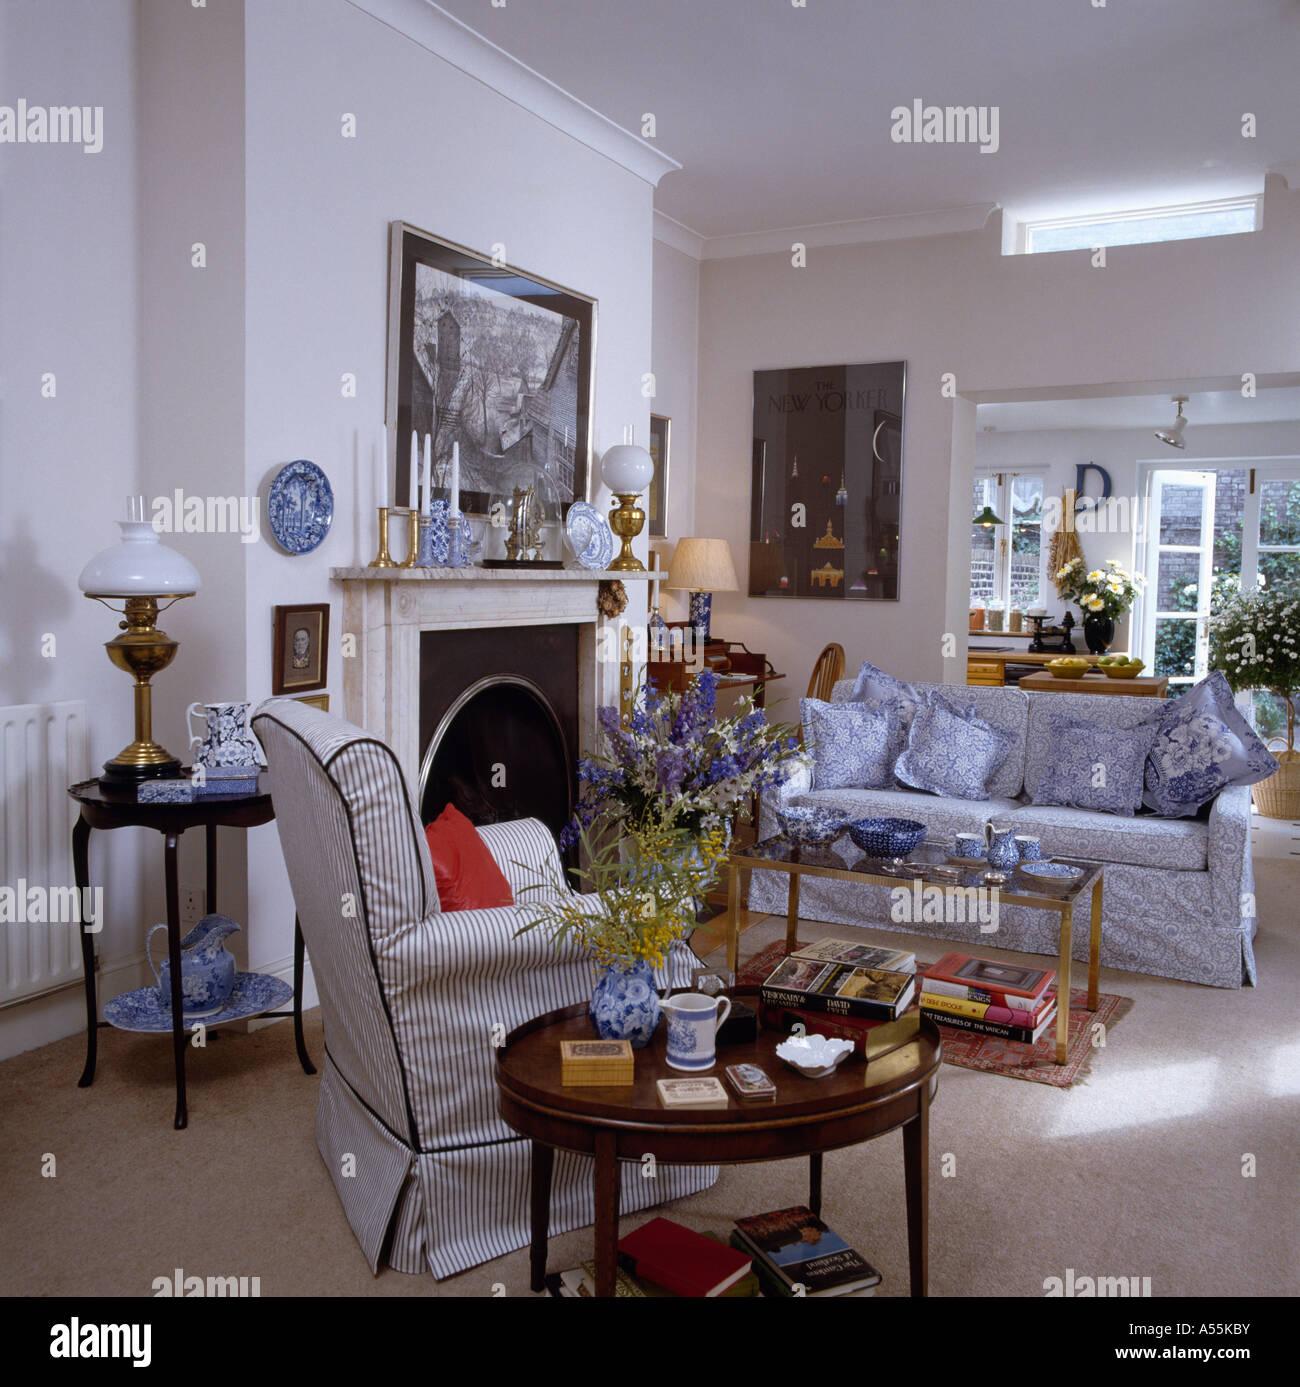 gartenhaus wei amazing deko fr gartenhaus innen neu. Black Bedroom Furniture Sets. Home Design Ideas